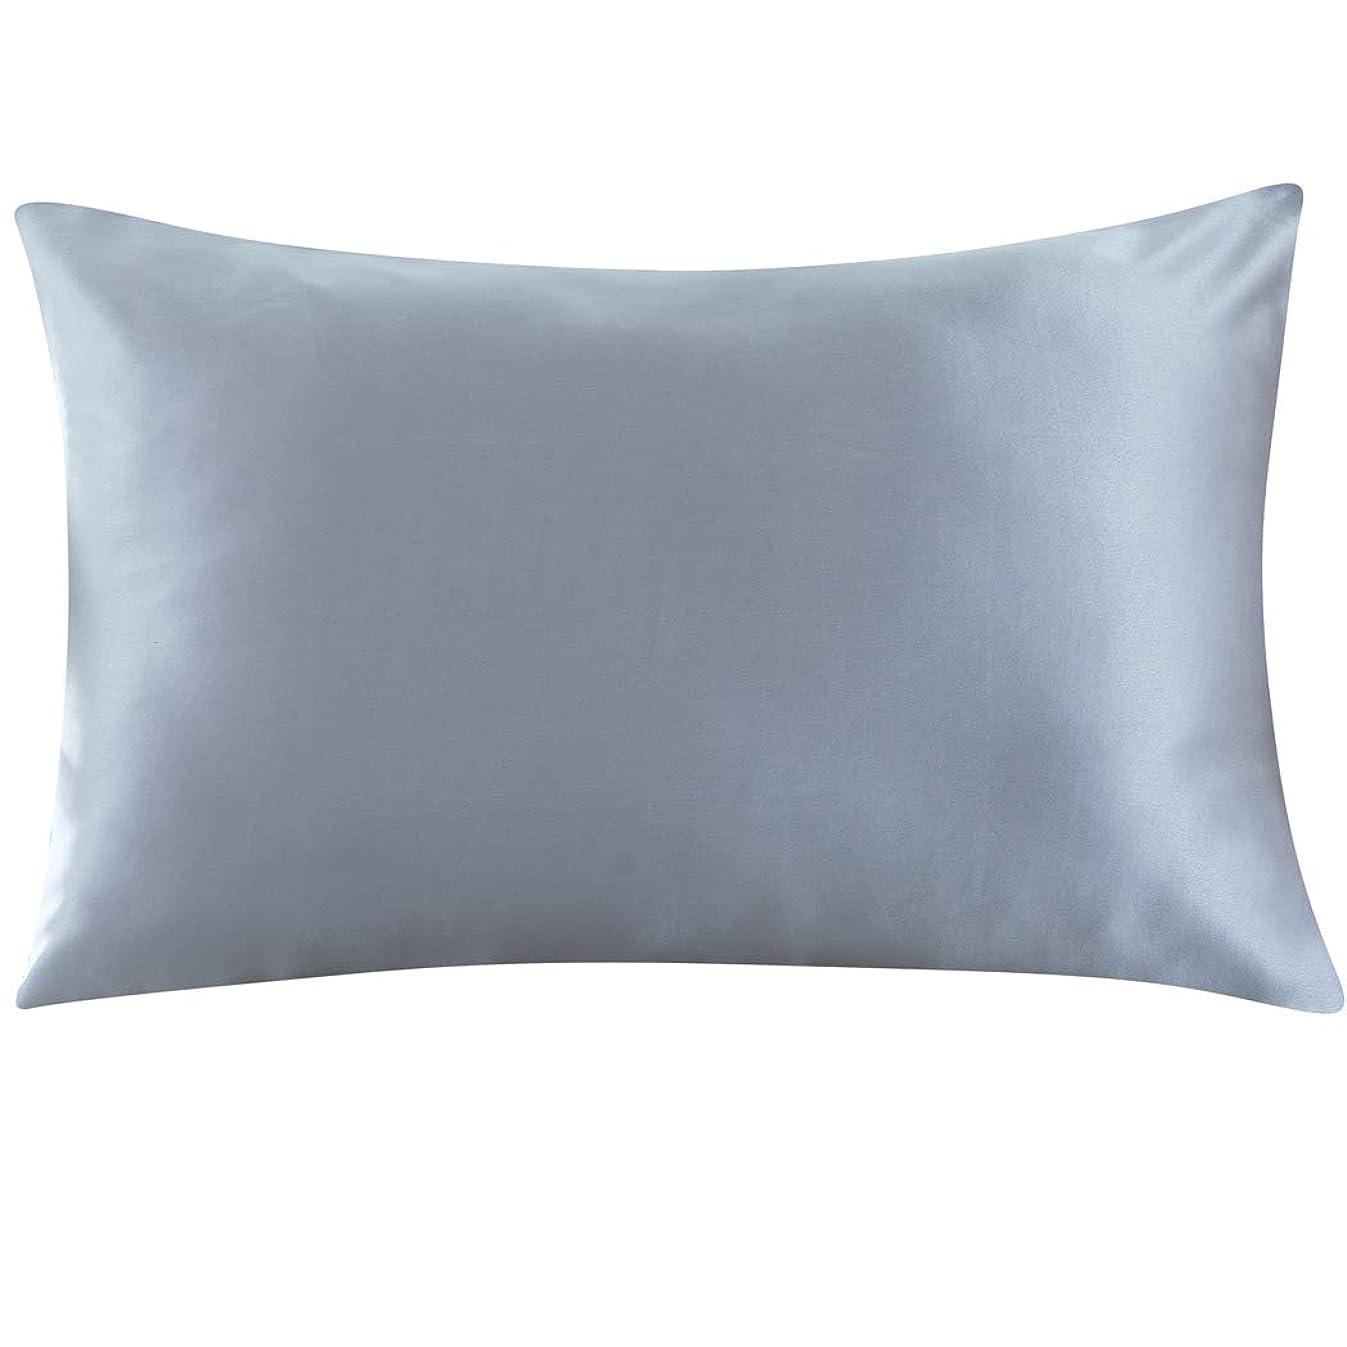 ZIMASILK 100% Mulberry Silk Pillowcase for Hair and Skin,with Hidden Zipper,Both Sides 19 Momme Silk, 1pc (Queen 20''x30'',Iron Grey)